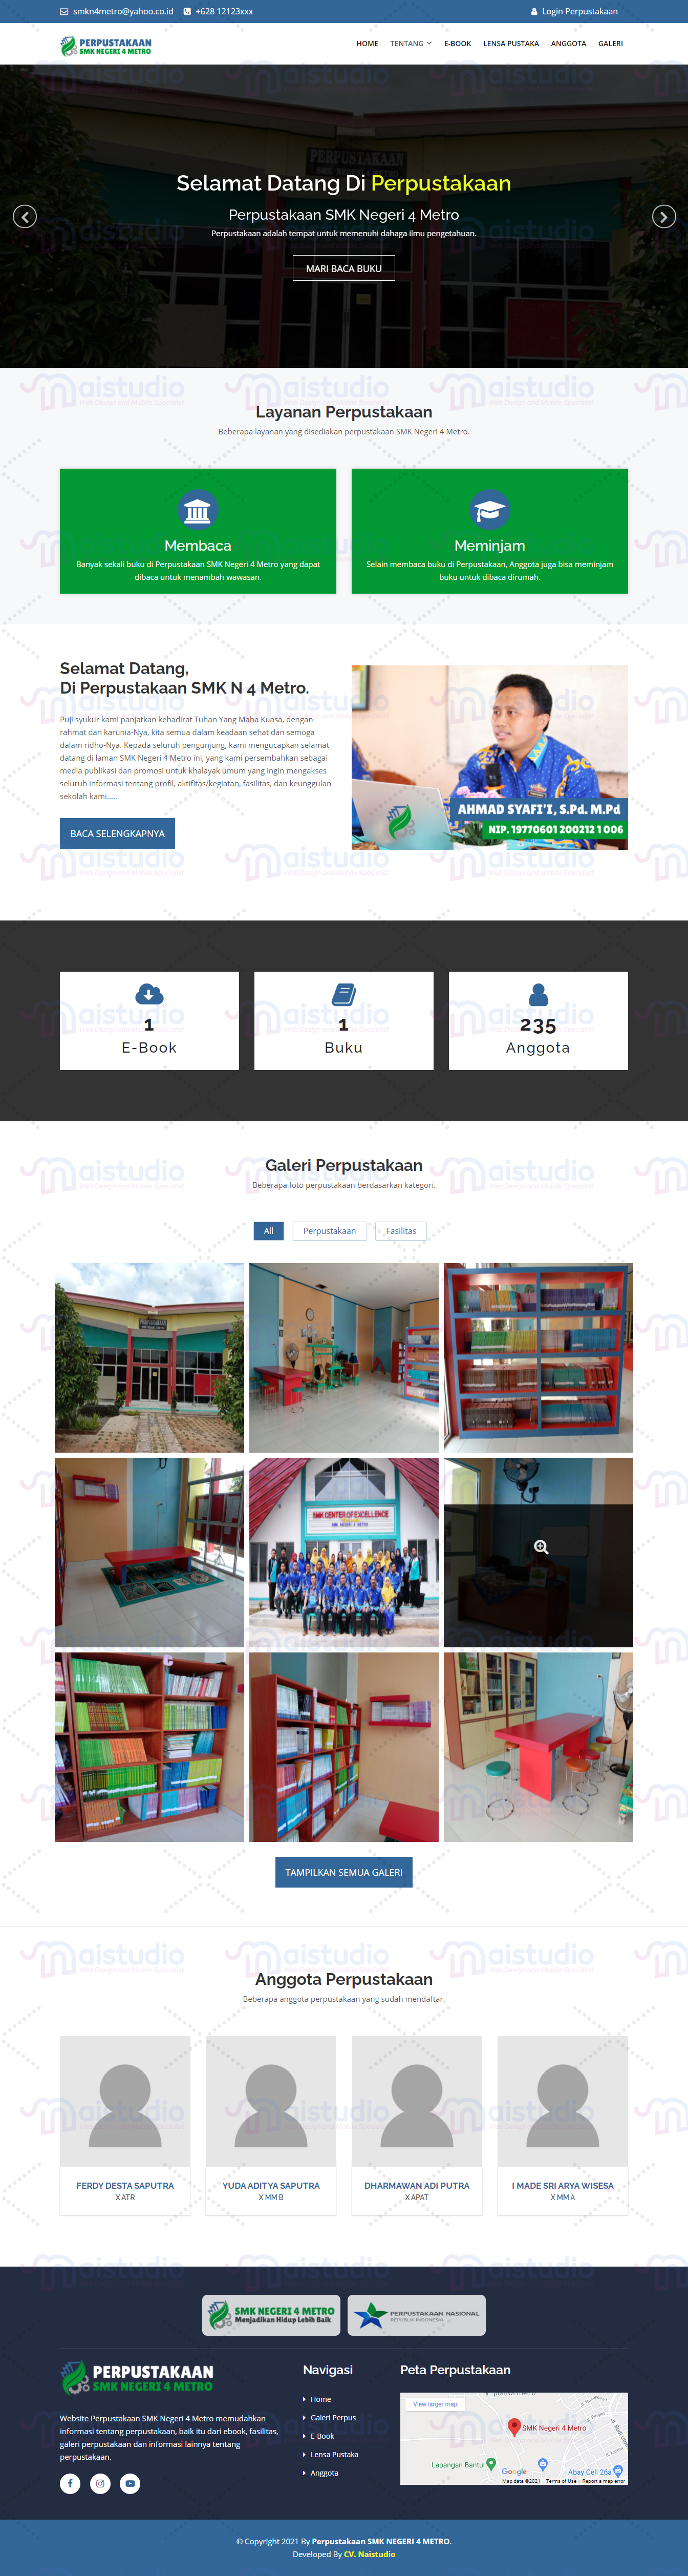 Aplikasi Layanan Perpustakaan Online SMK Negeri 4 Metro